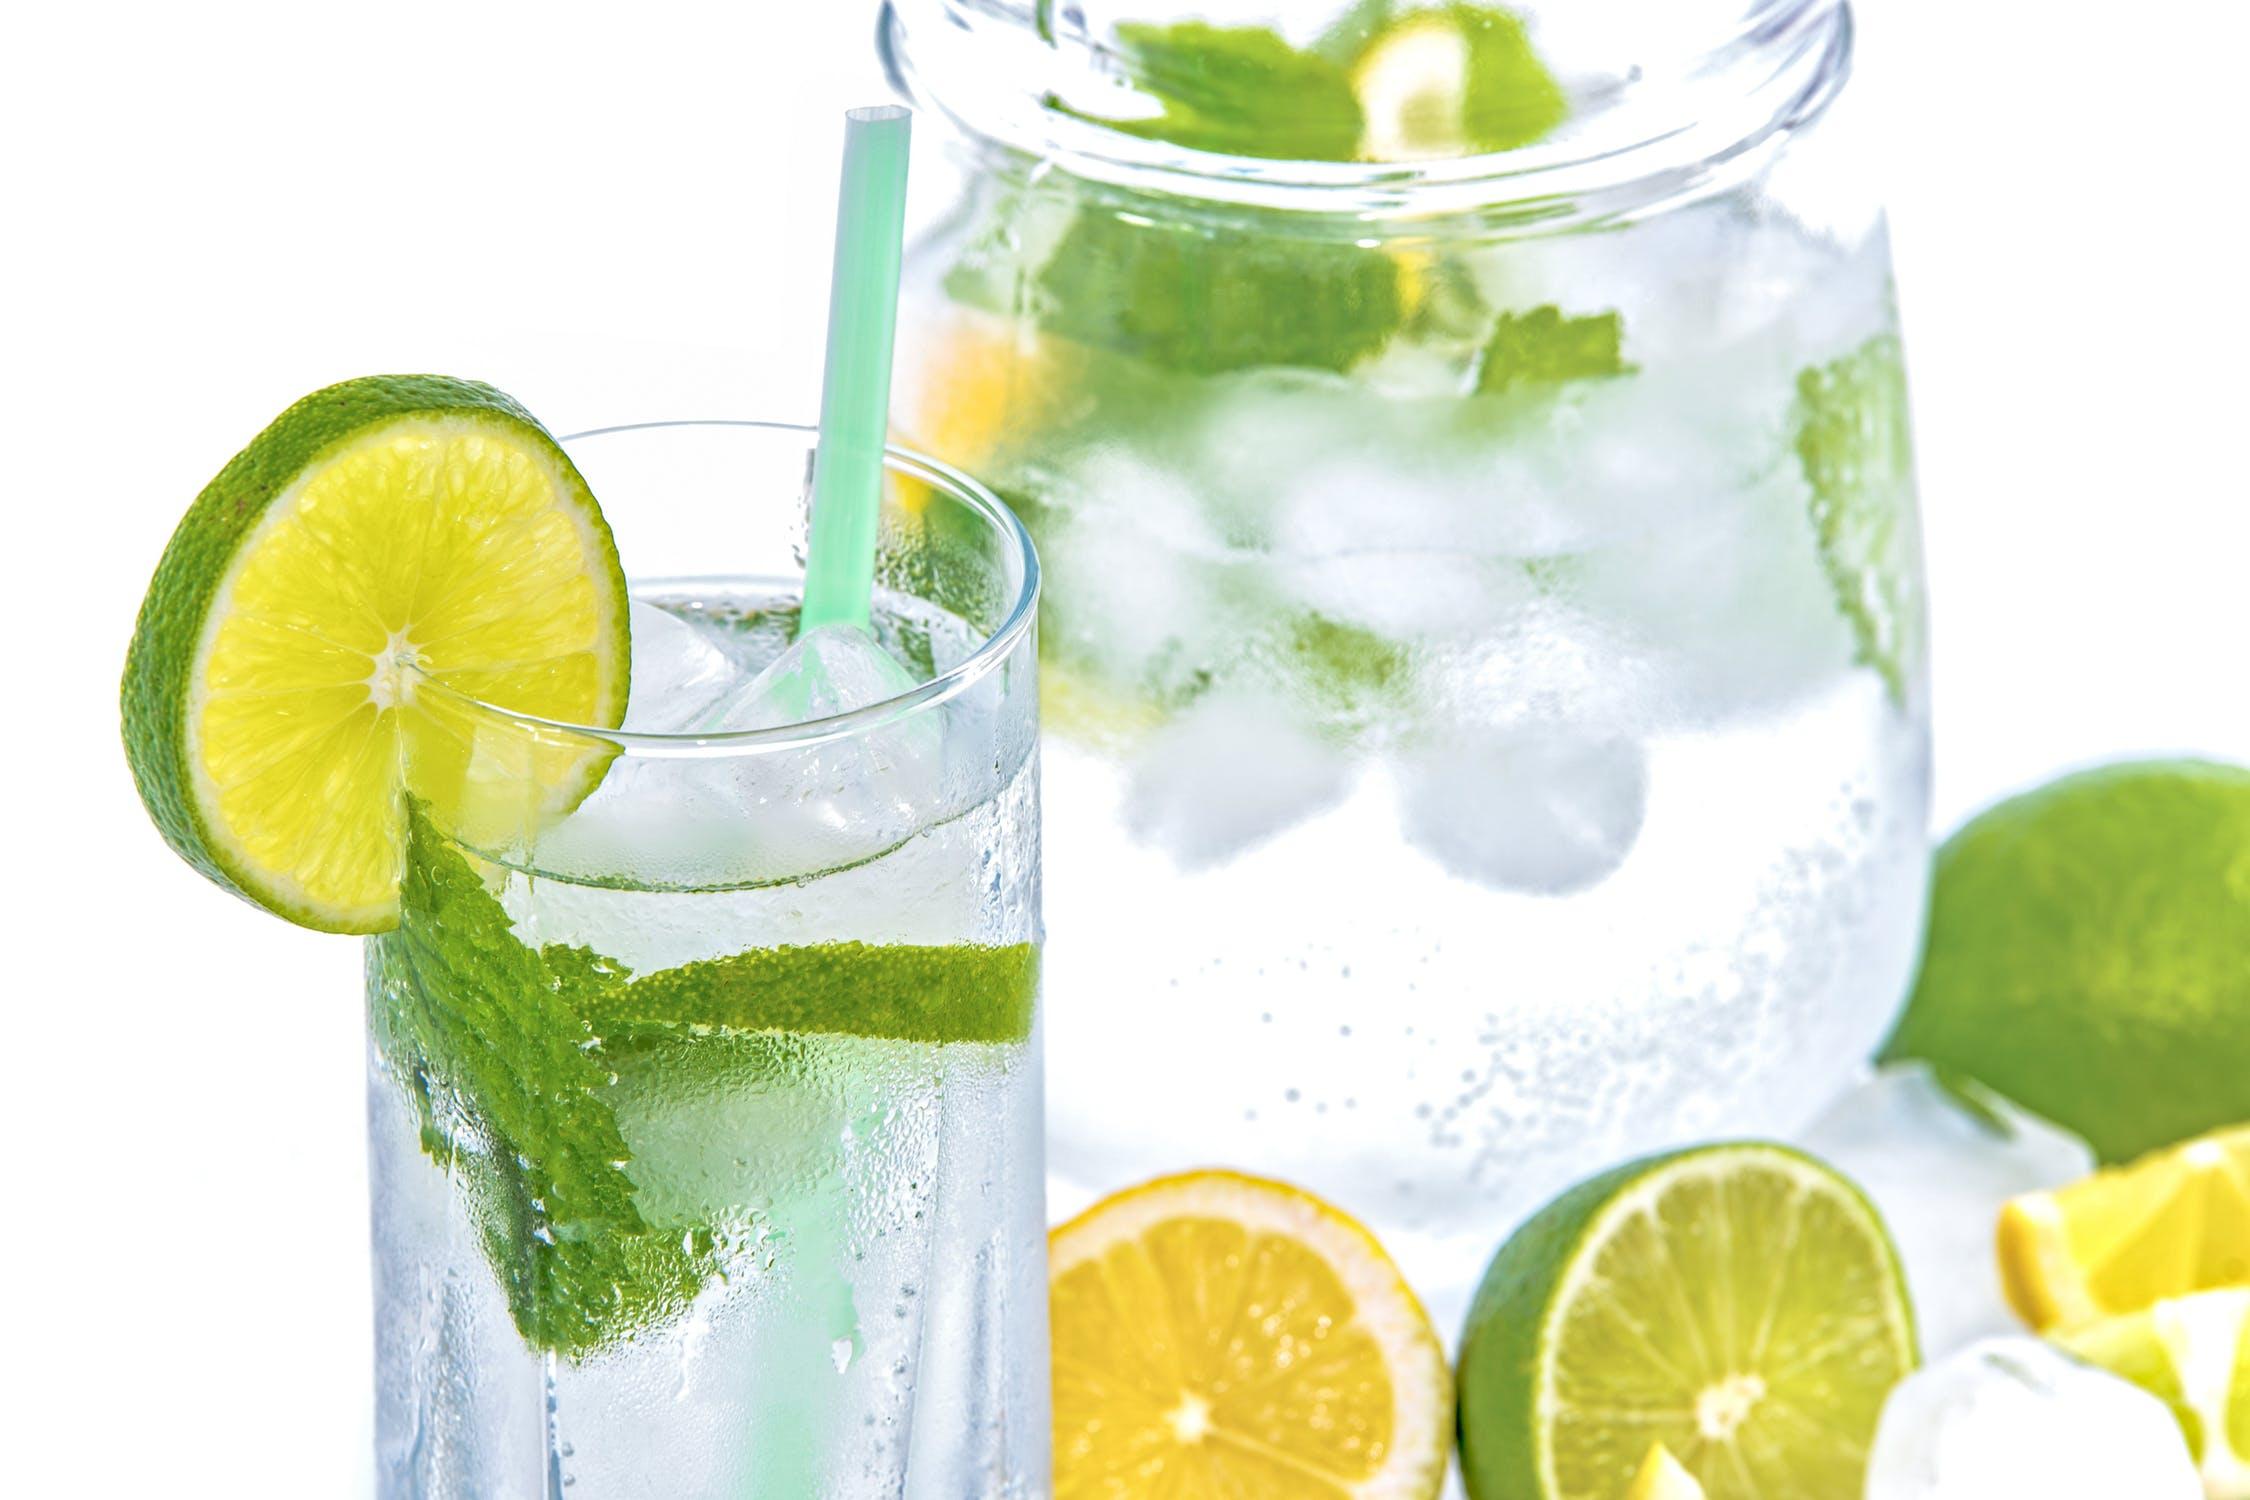 alimenti brucia grassi, acqua detox per dimagrire